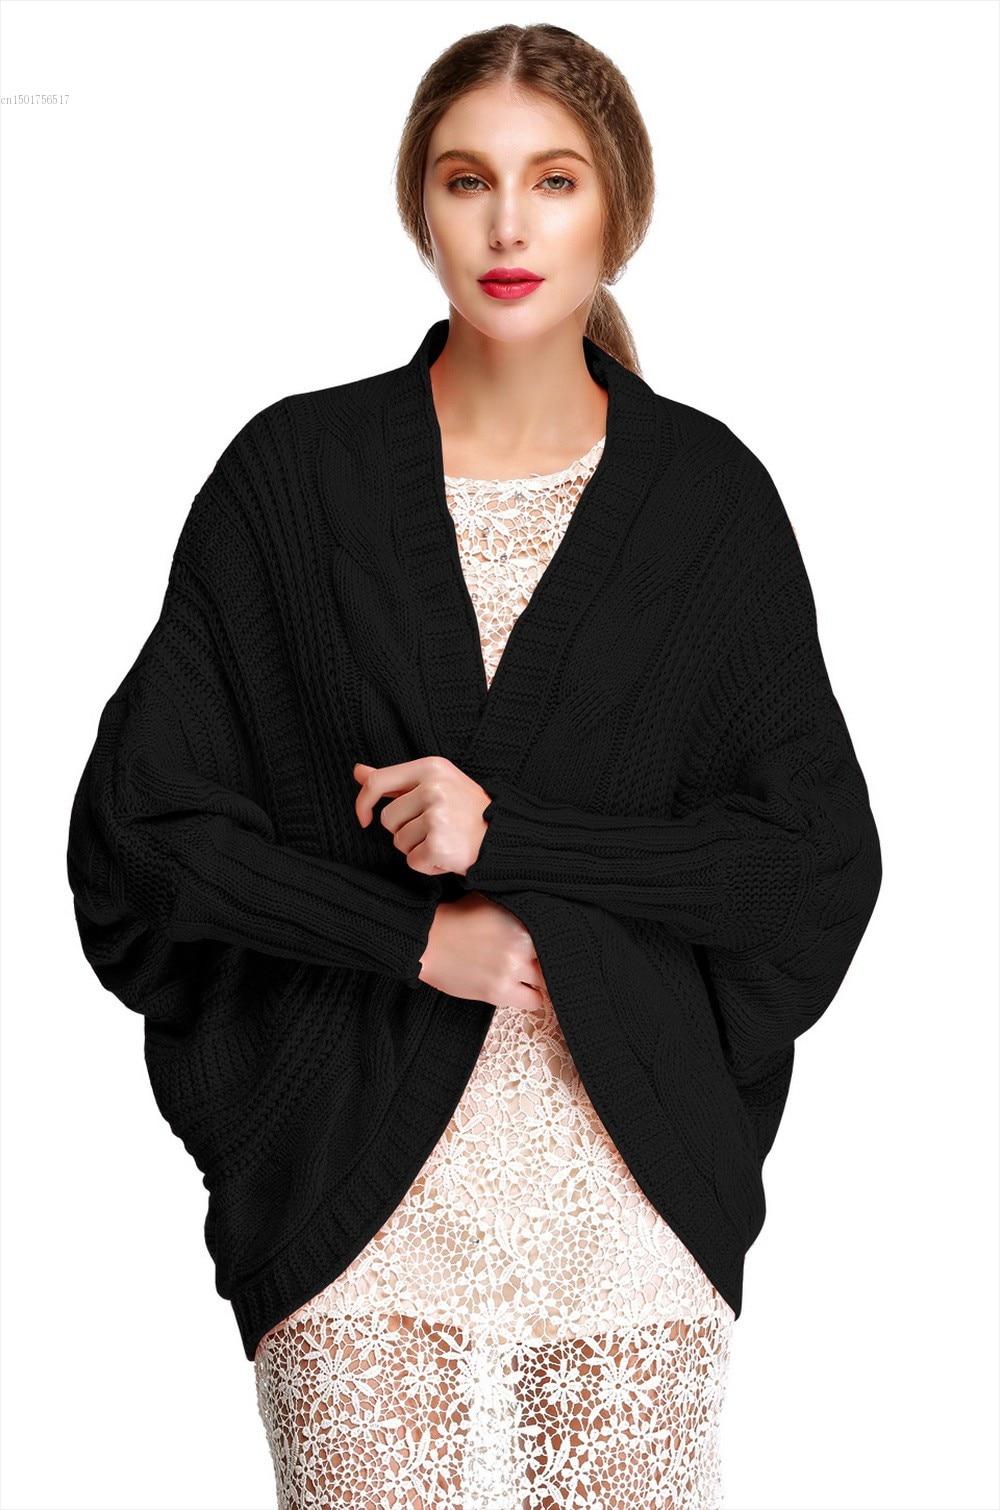 New Korean Loose Twist Pattern Sweaters Tops Bat Sleeves Knitted ...